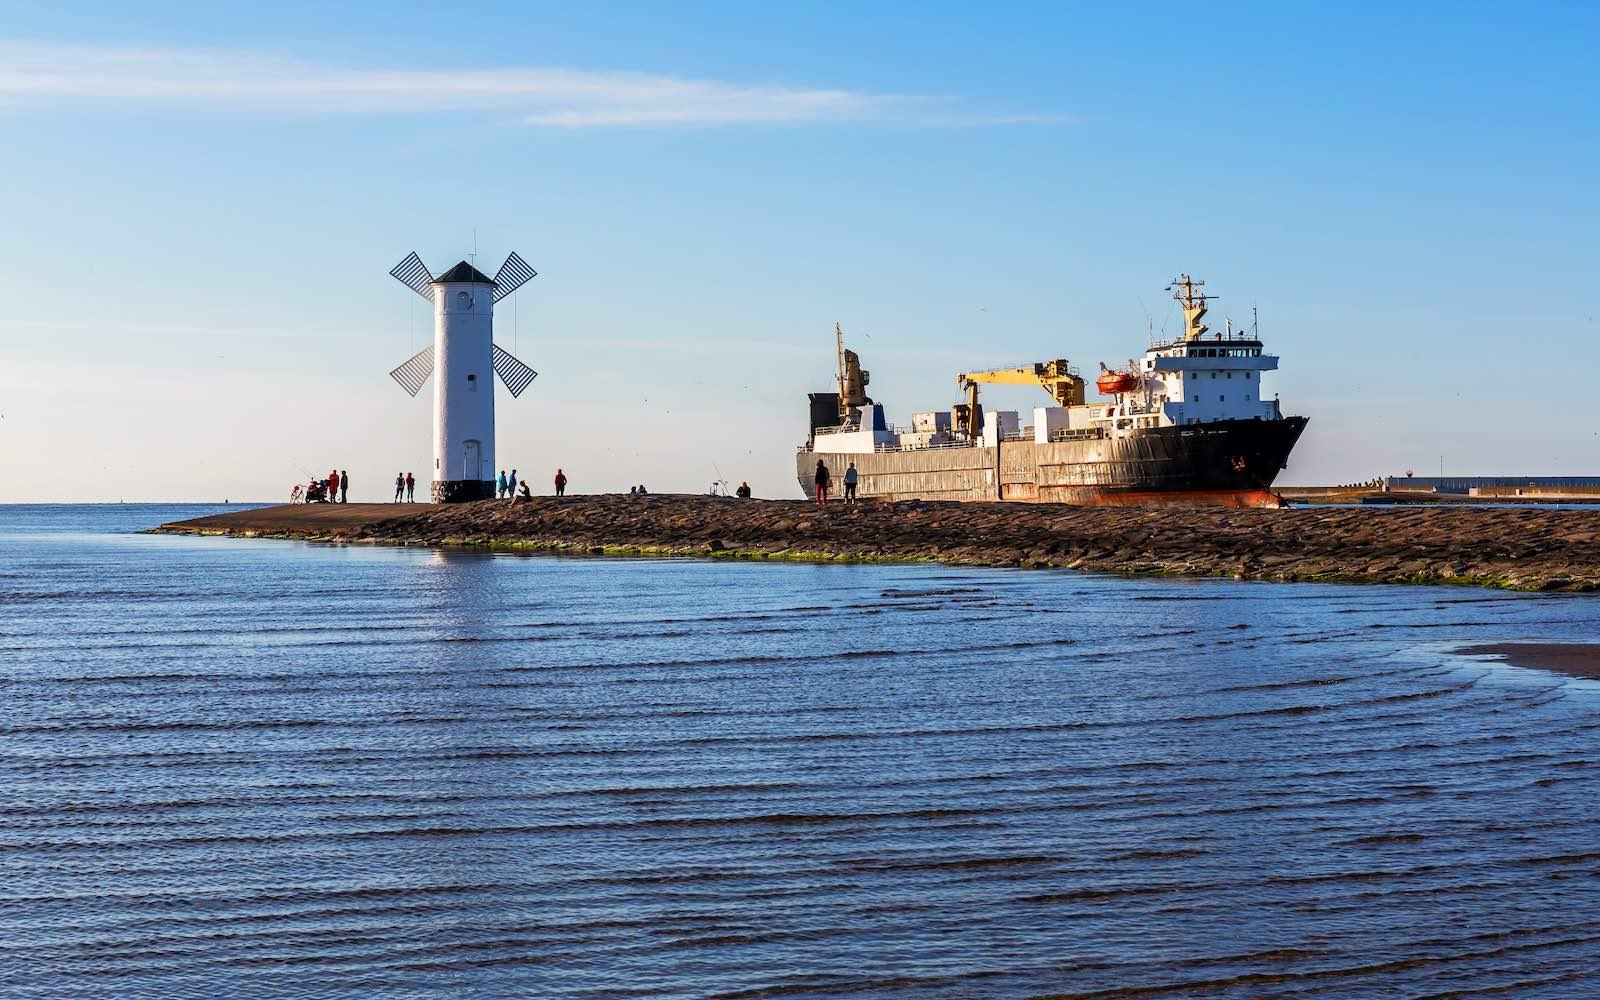 Świnoujście, Poland, on the Baltic Sea (Getty Images)